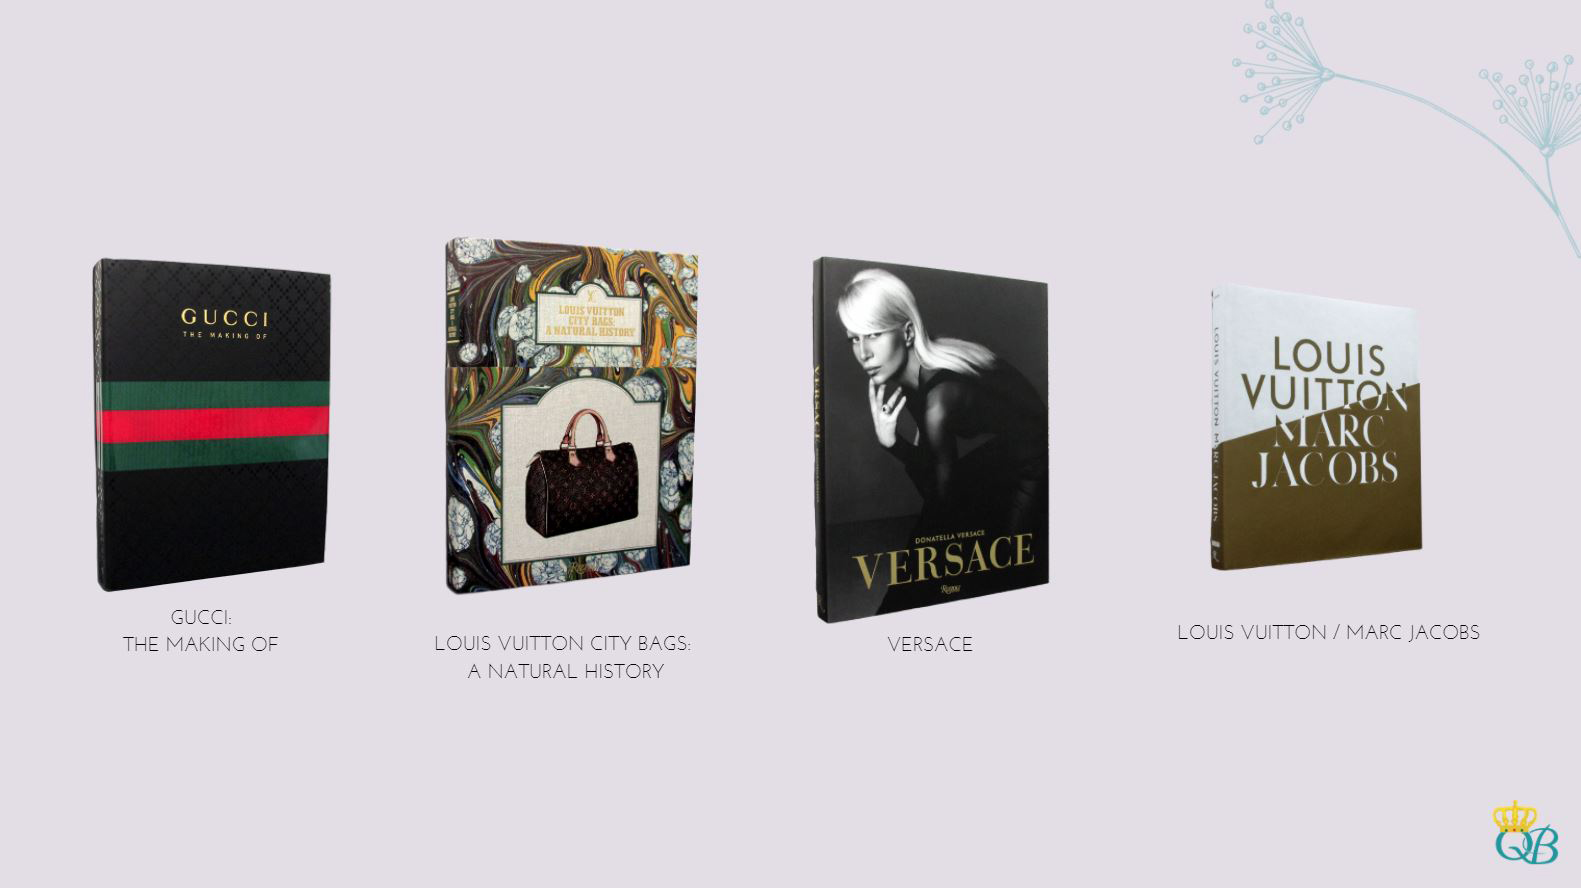 Livros: Gucci: The Making Of, Louis Vuitton City Bags: A Natural History, Versace, Louis Vuitton/Marc Jacobs.